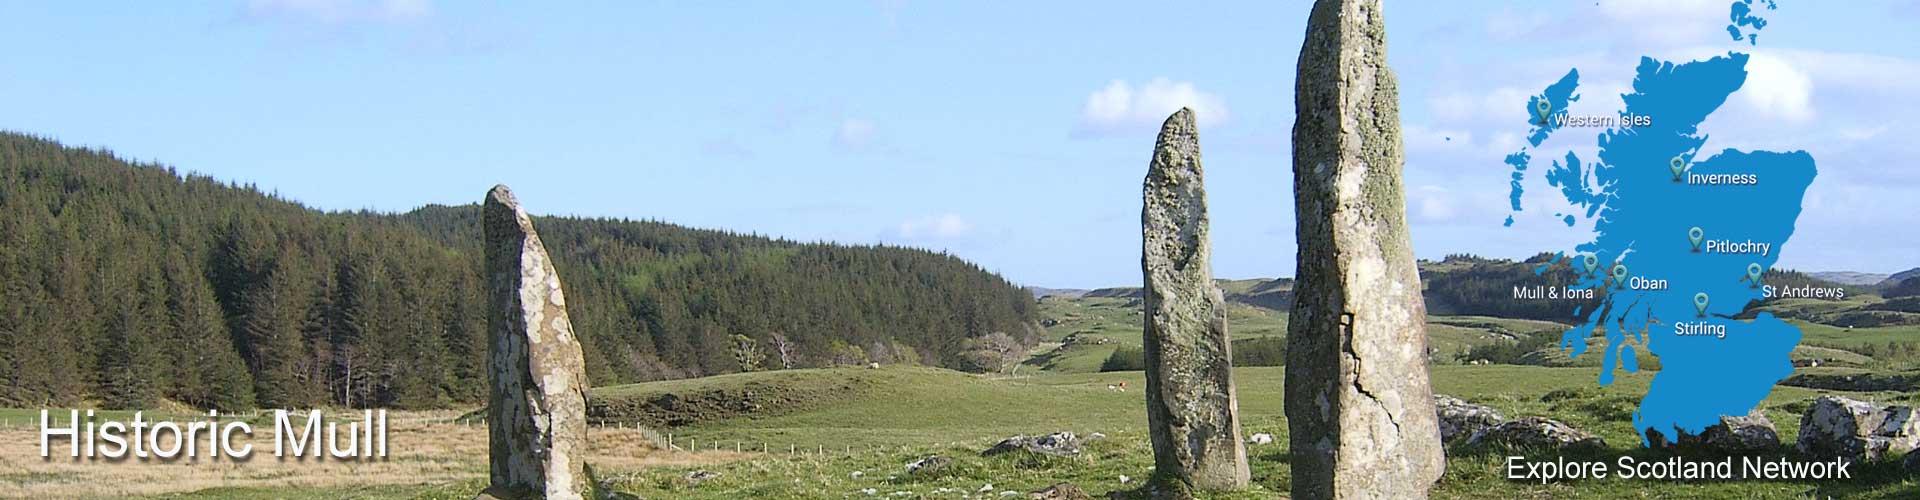 Isle of Mull history